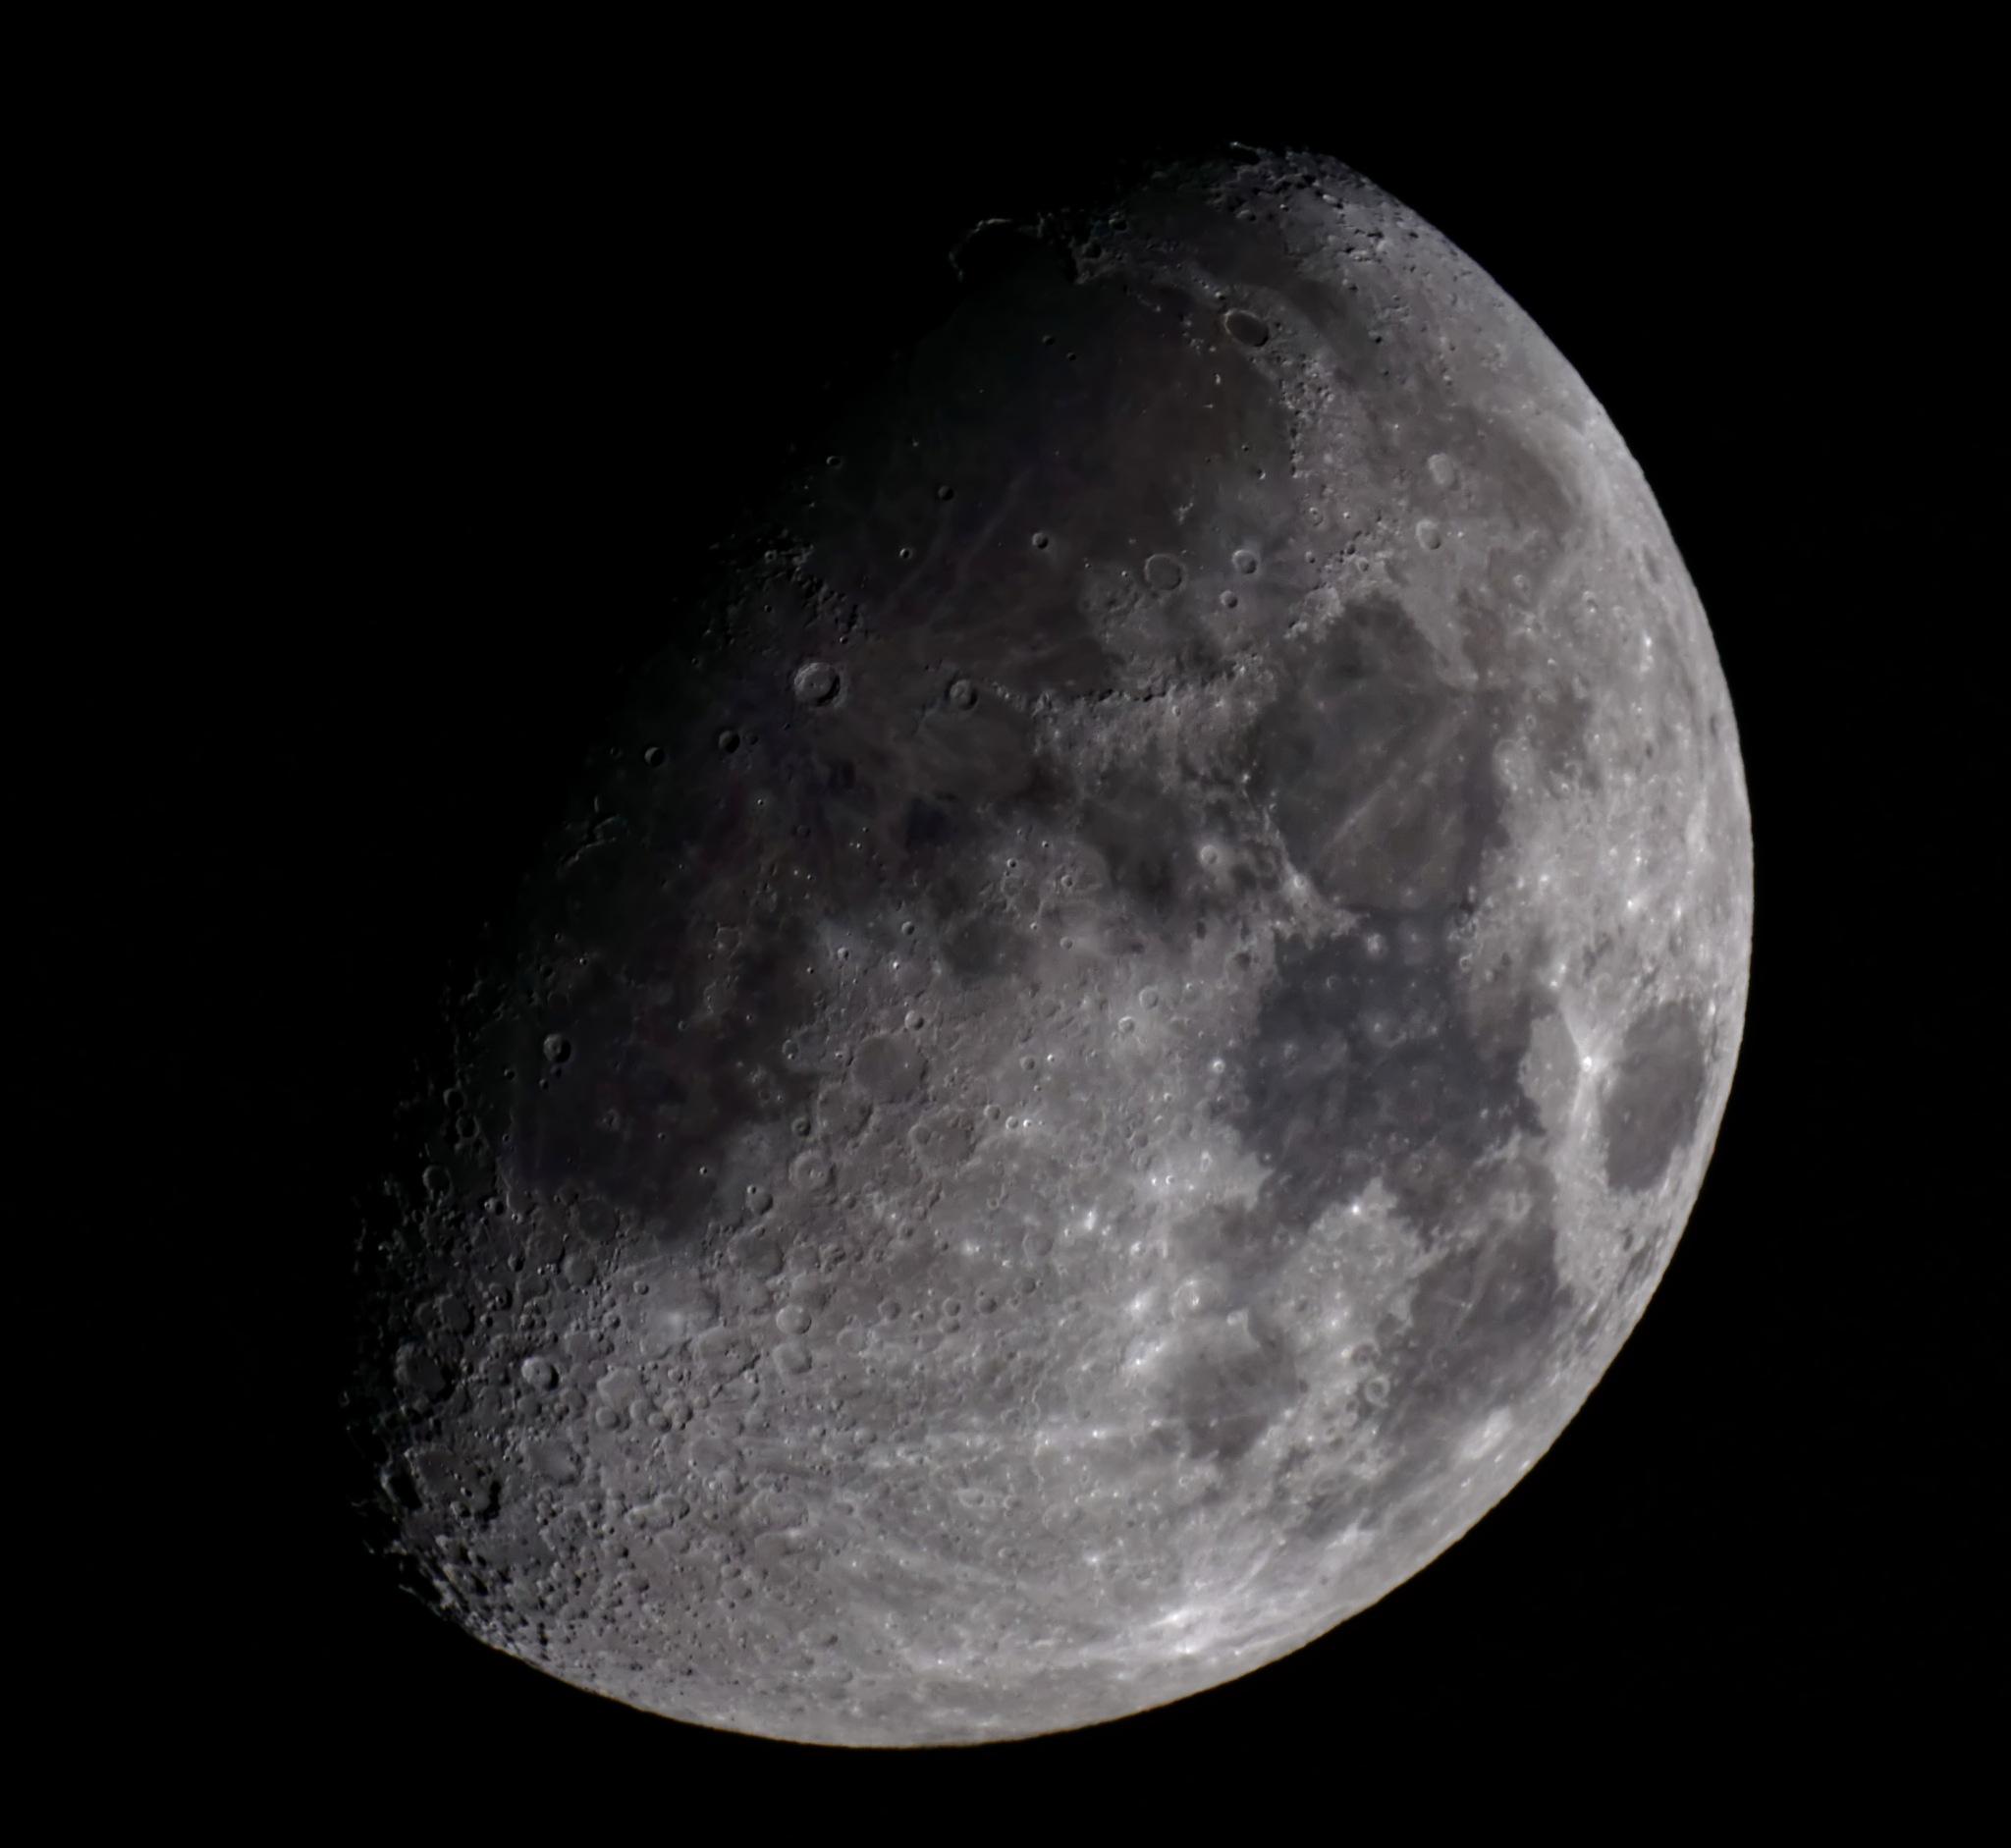 Winter Moon by Michal Lewandowski